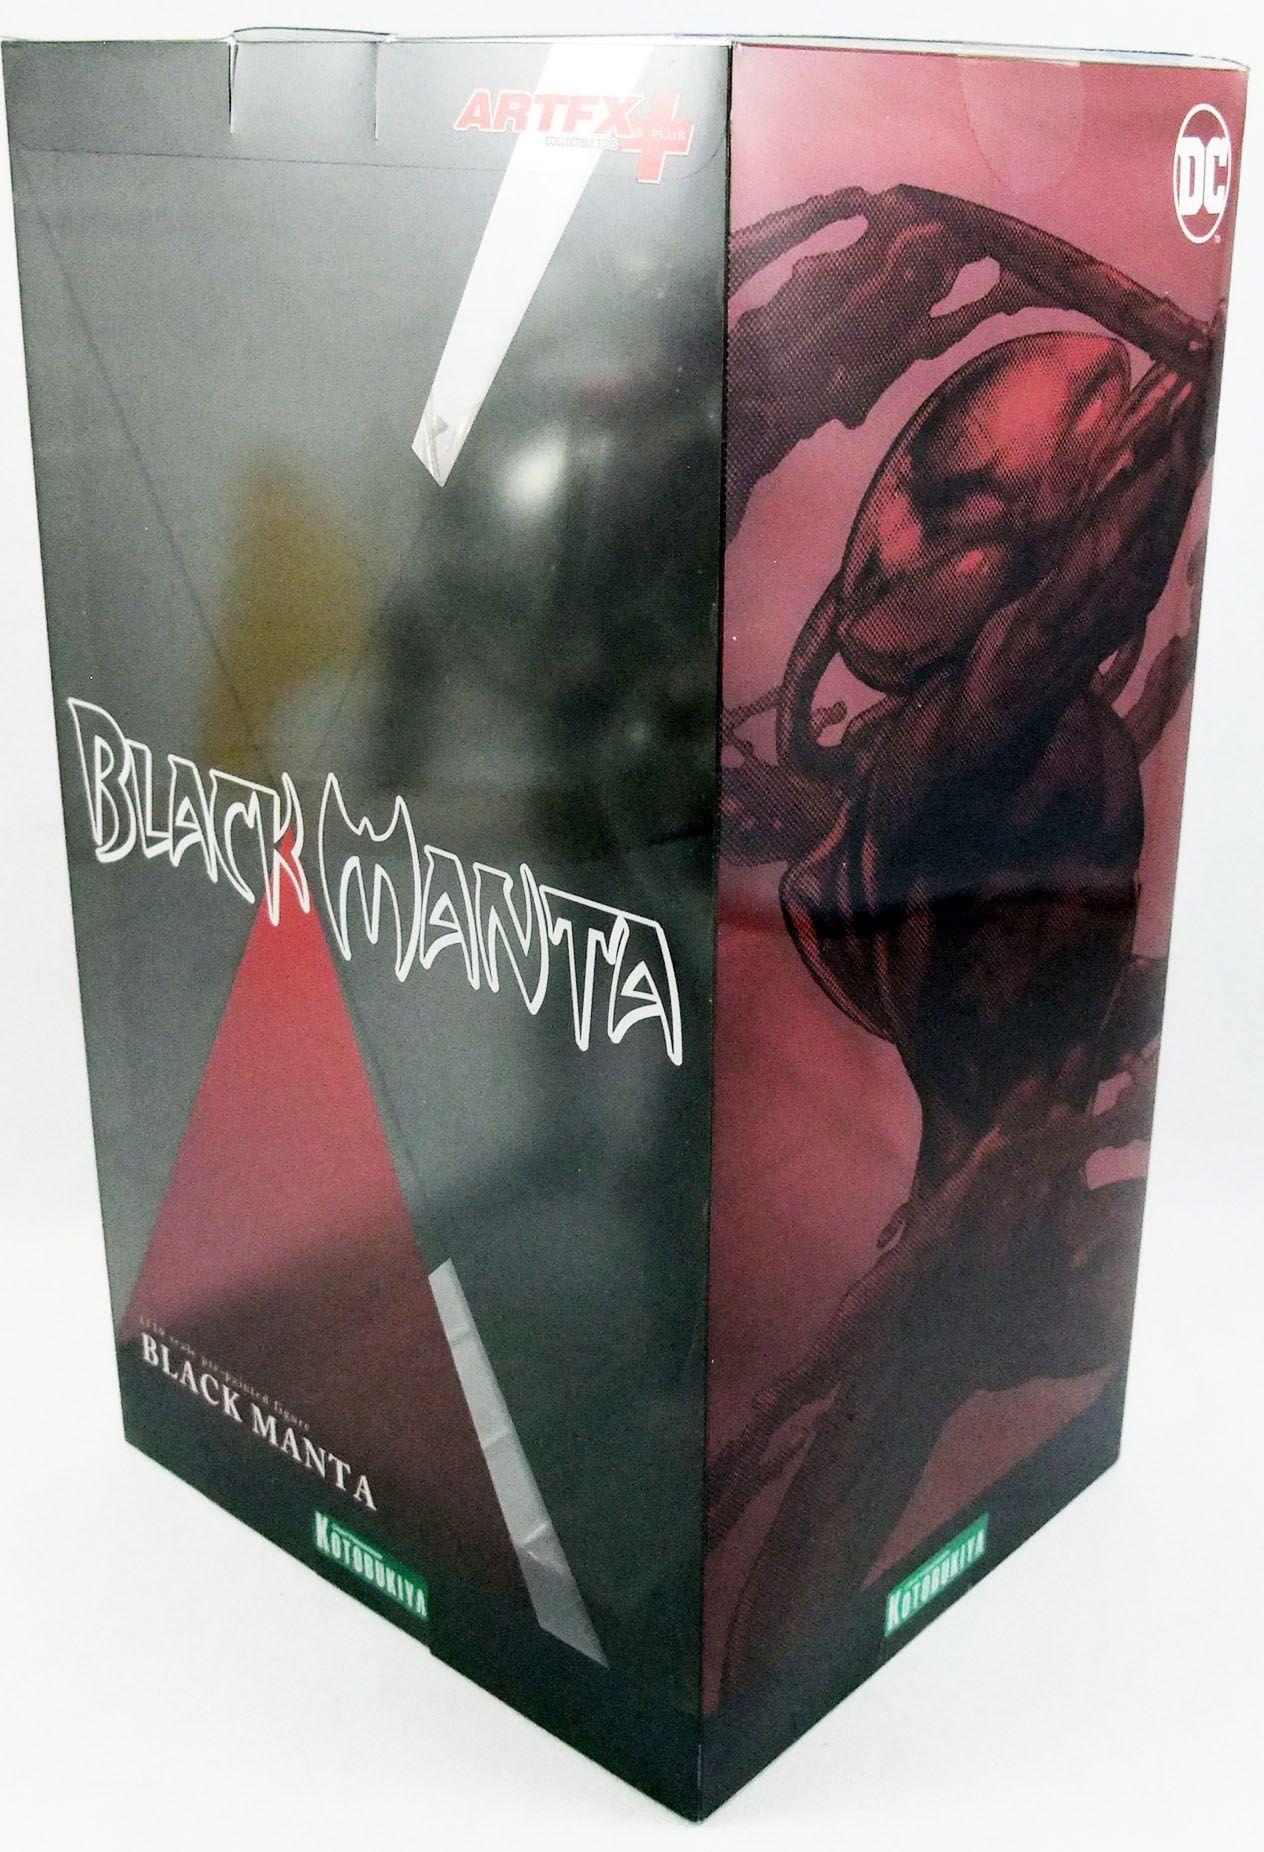 Justice League The New 52 Black Manta ArtFX Statue - Kotobukiya